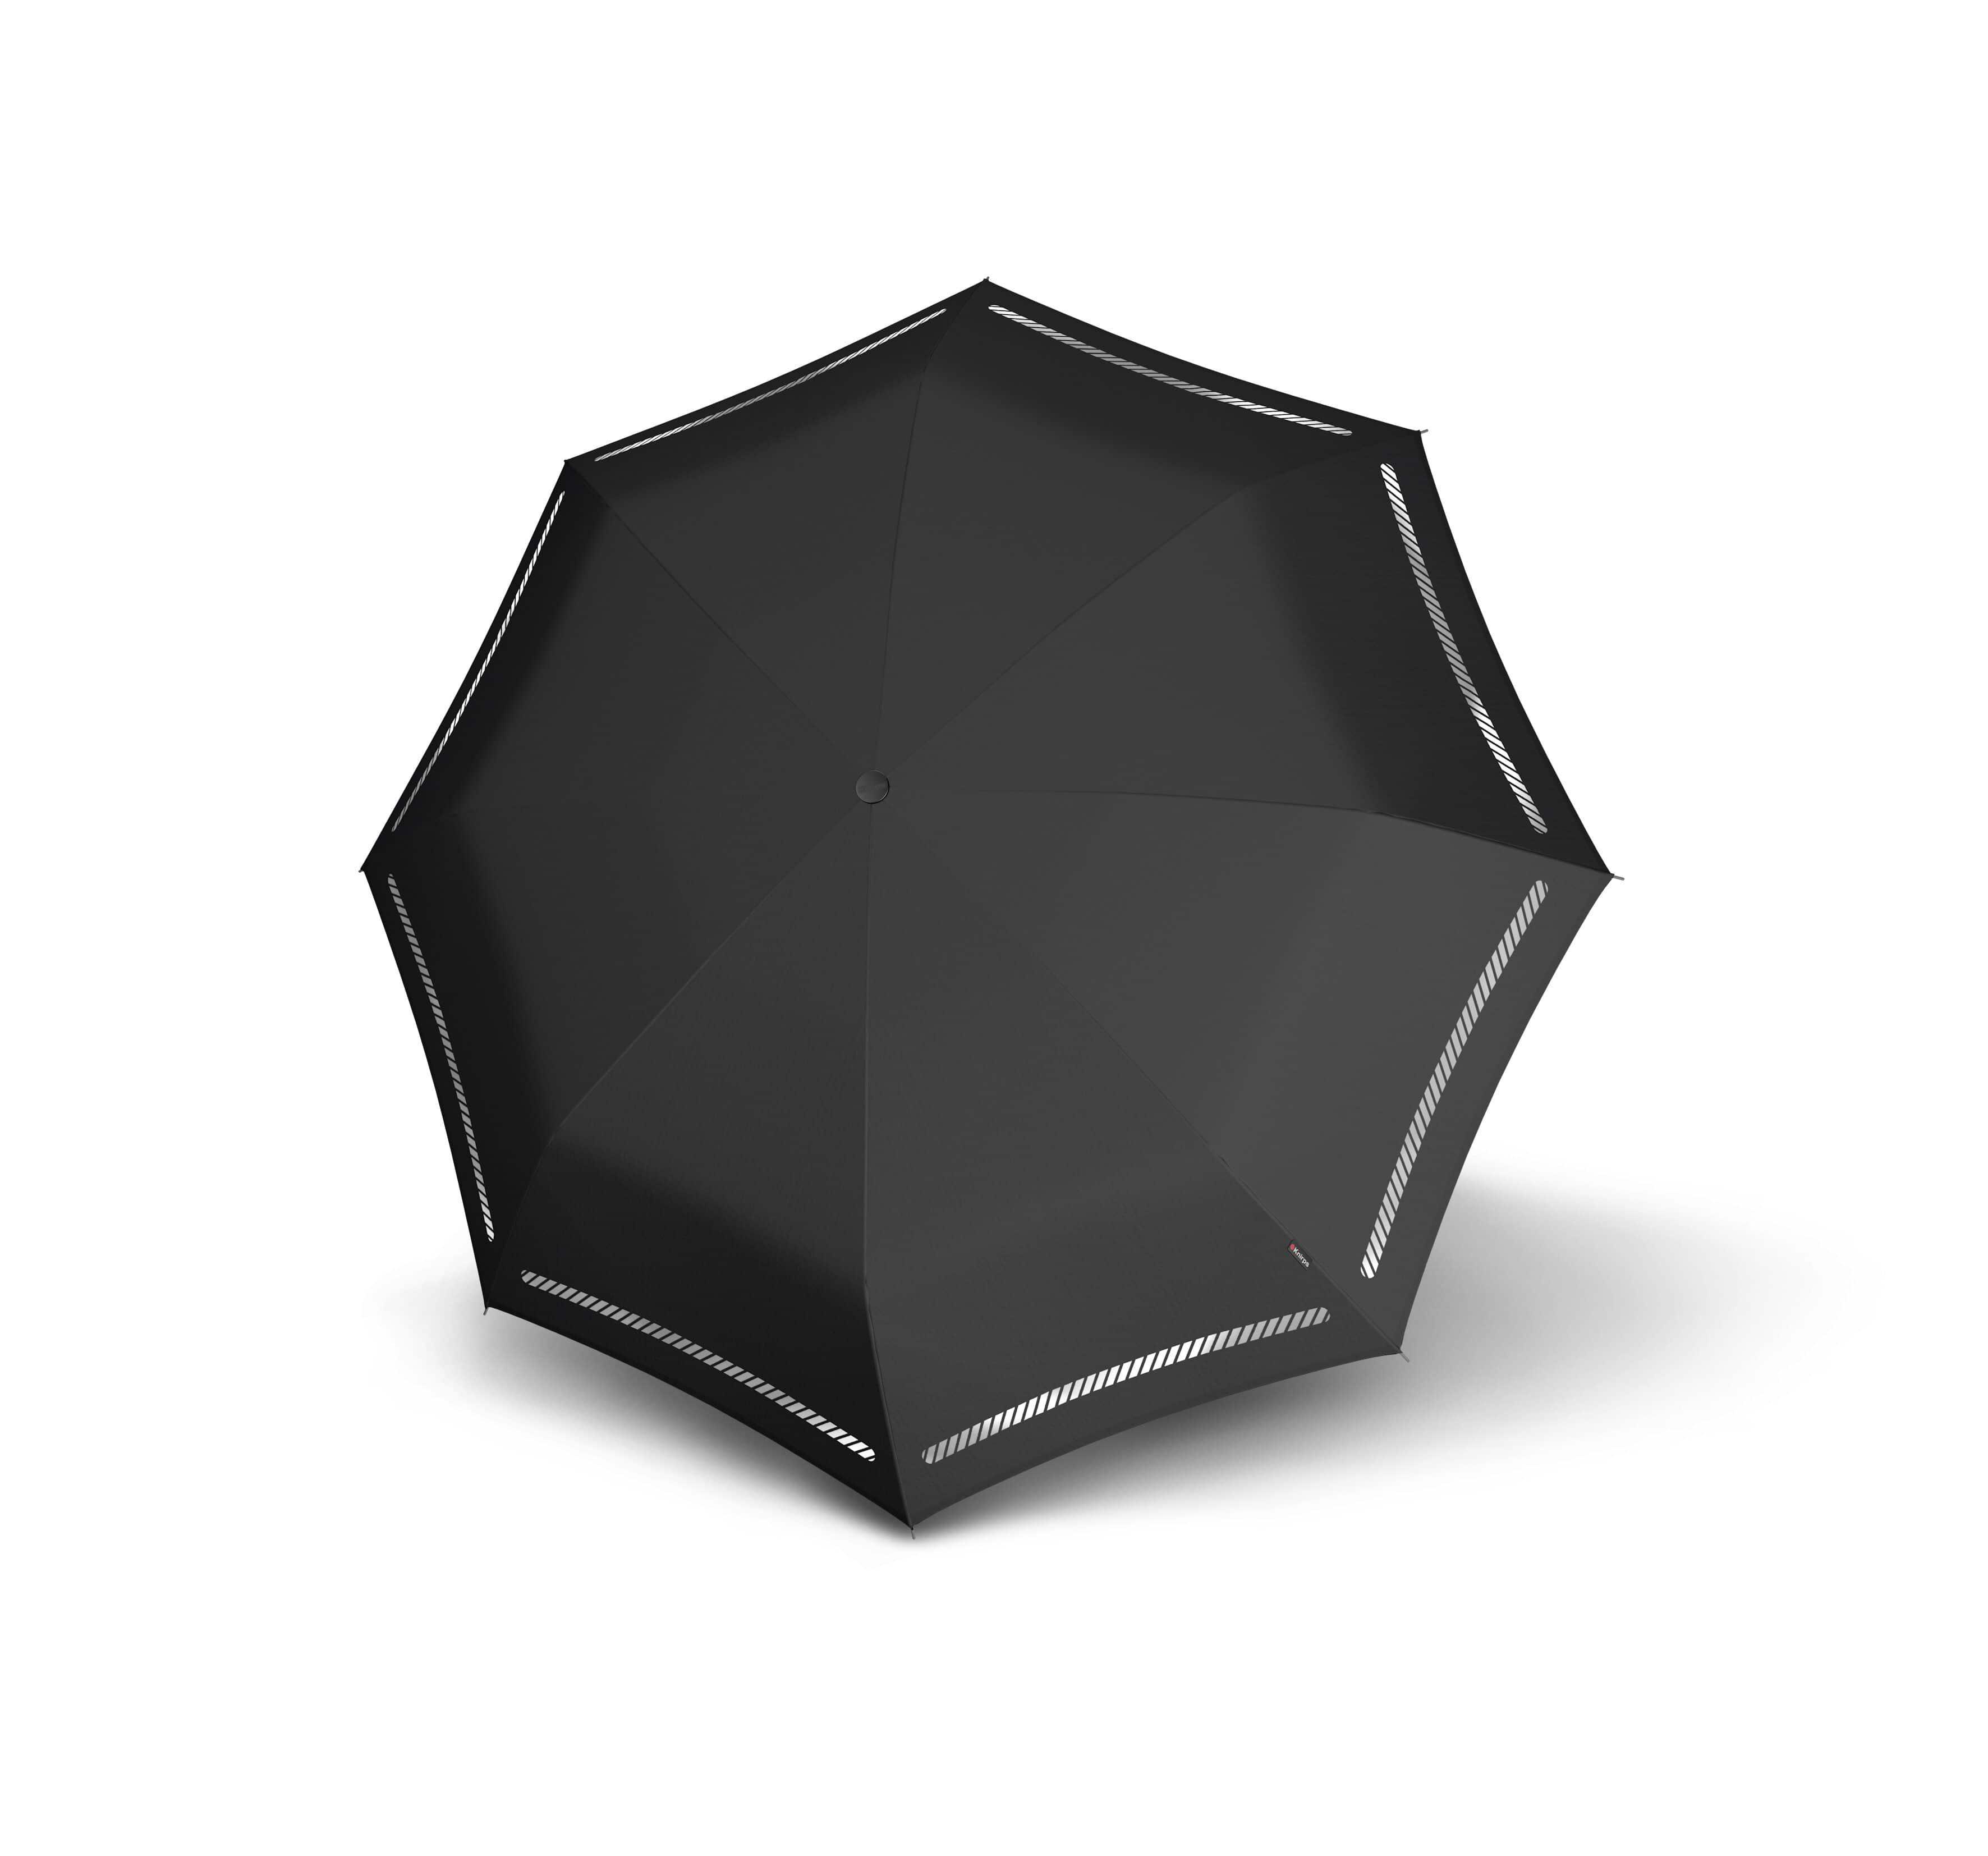 Knirps Umbrella T.200 medium duomatic new - foto 2